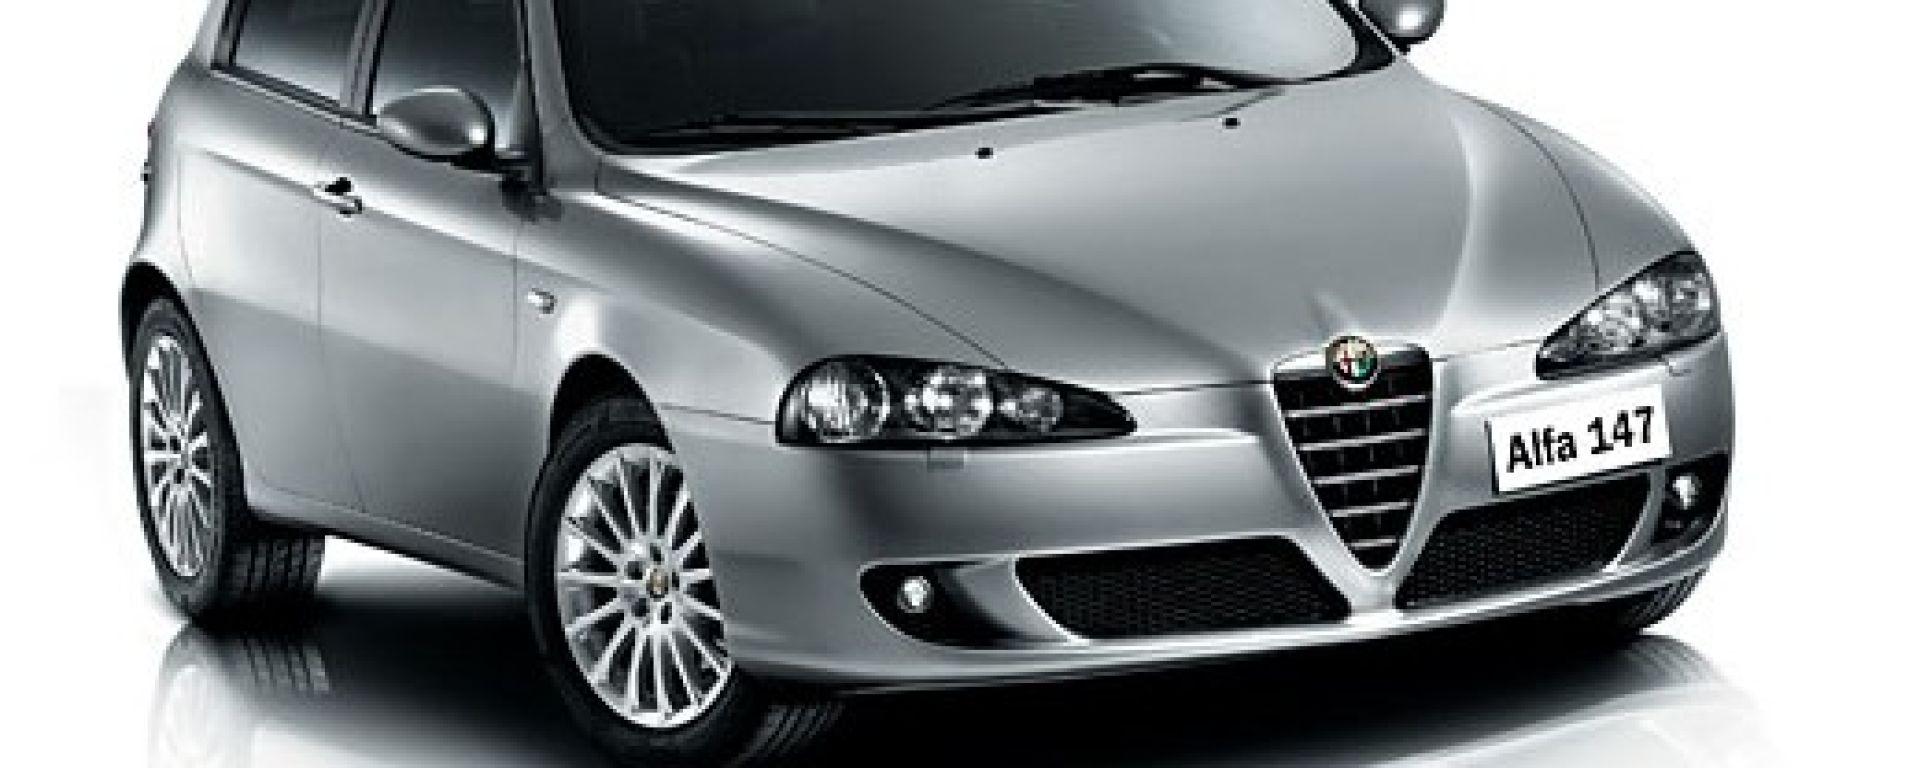 Anteprima: Alfa Romeo 147 2005